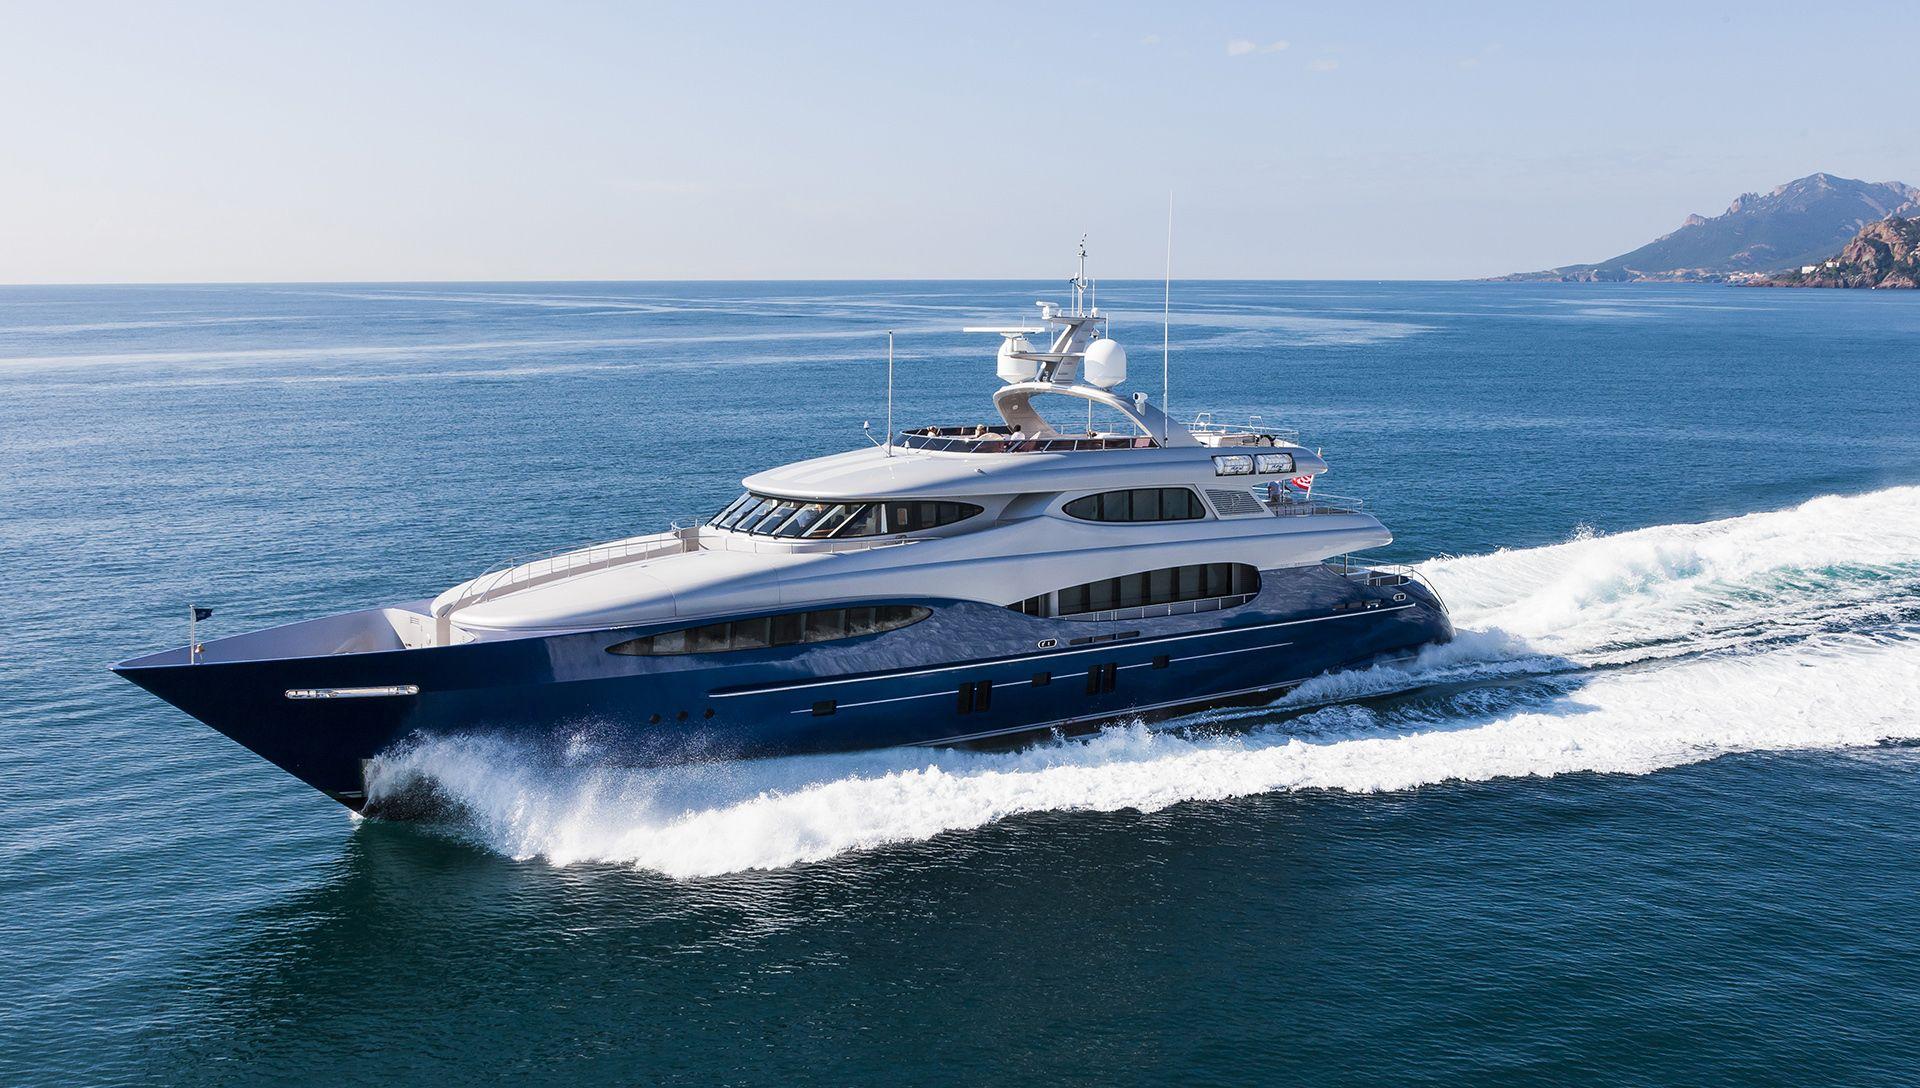 46 Meter Luxury Yacht Picture HD Wallpaper